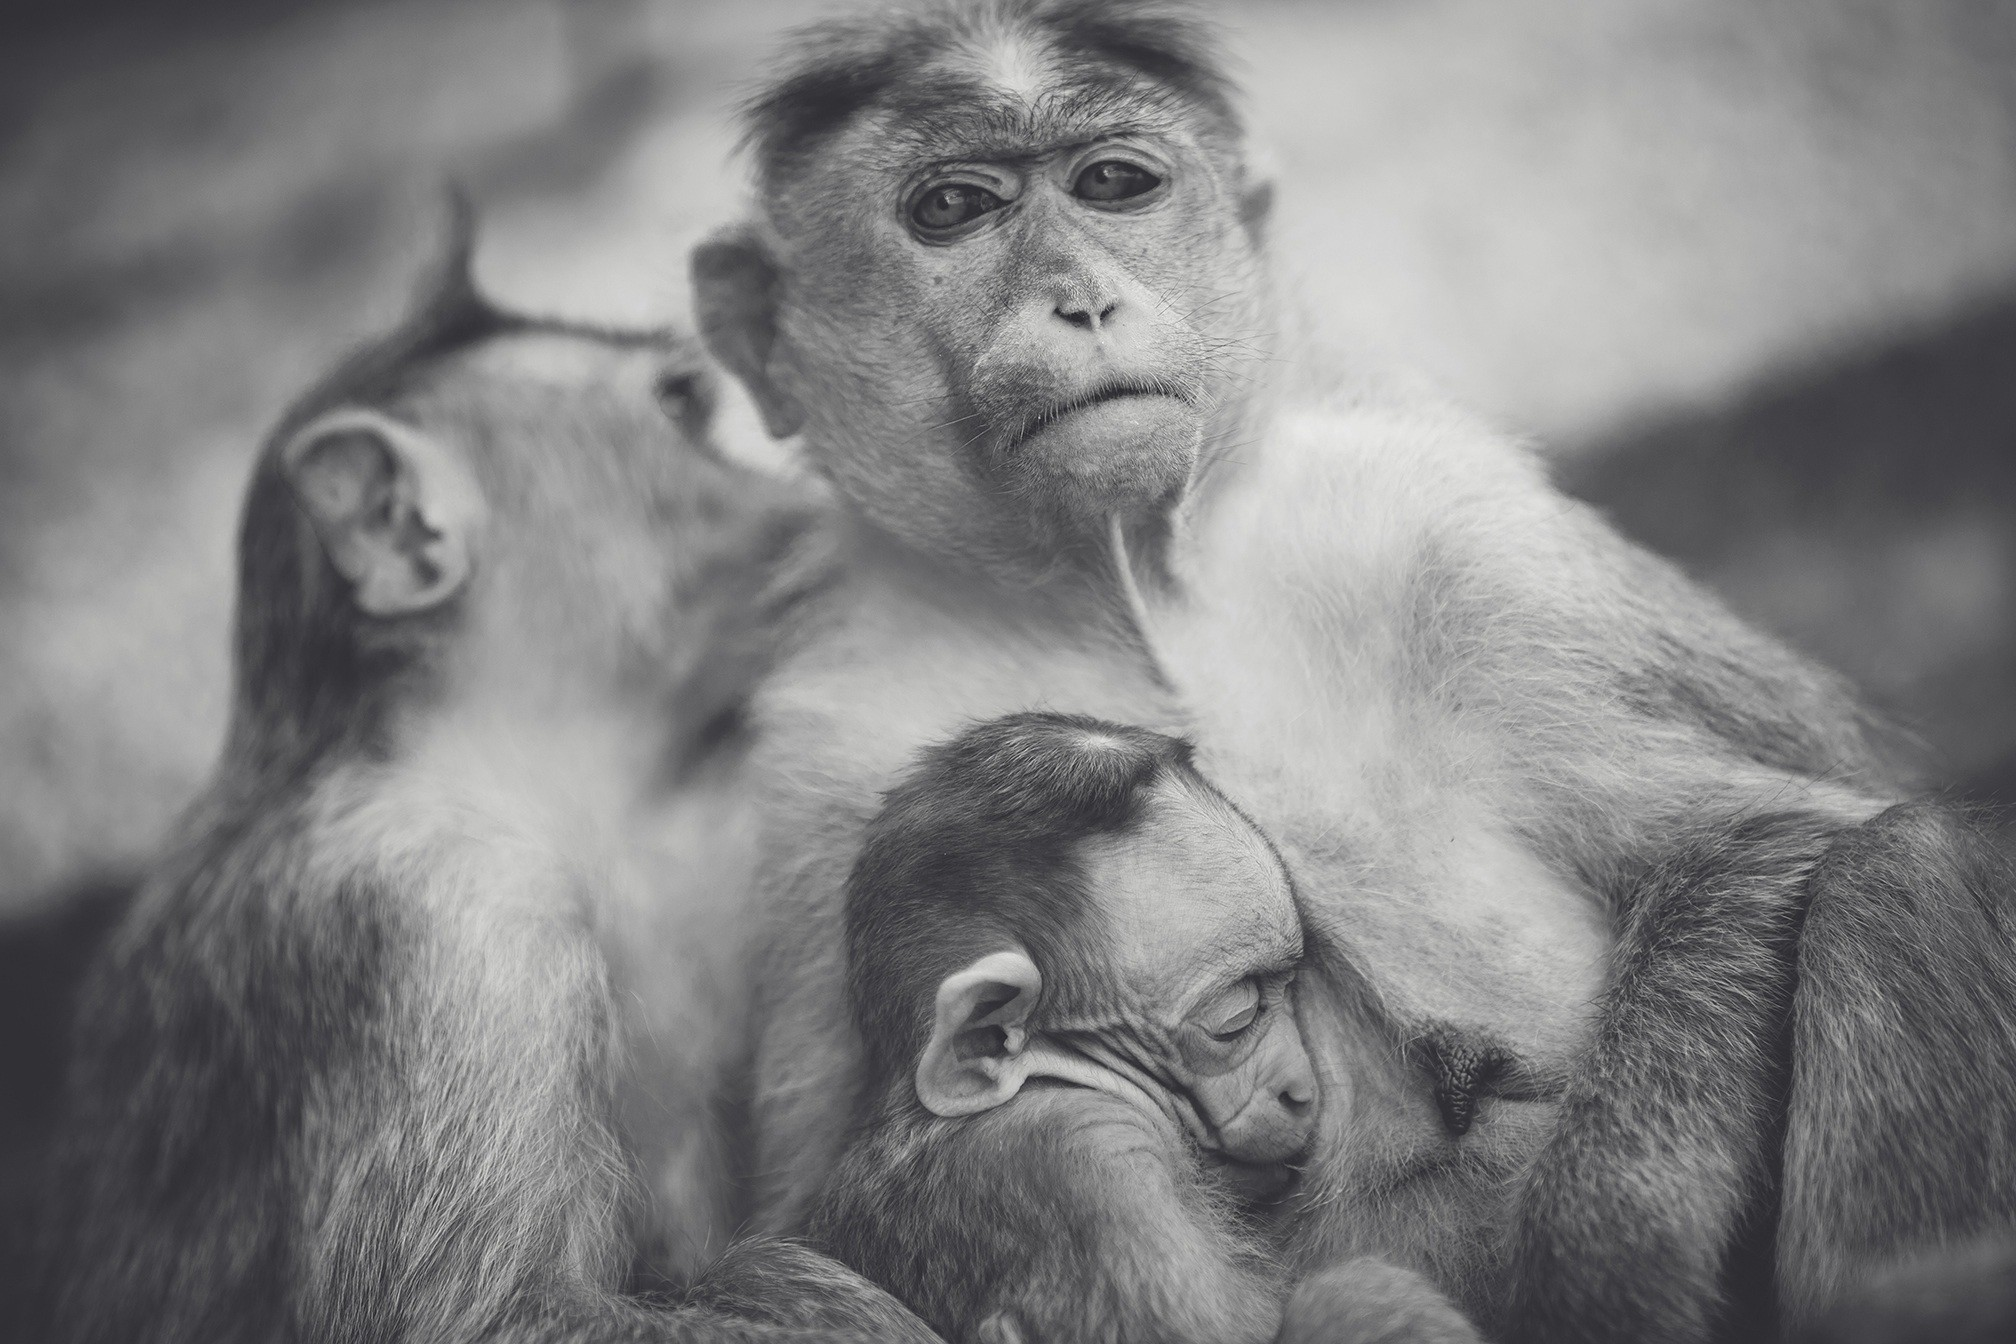 Wallpaper Monkey, Baby, Bw